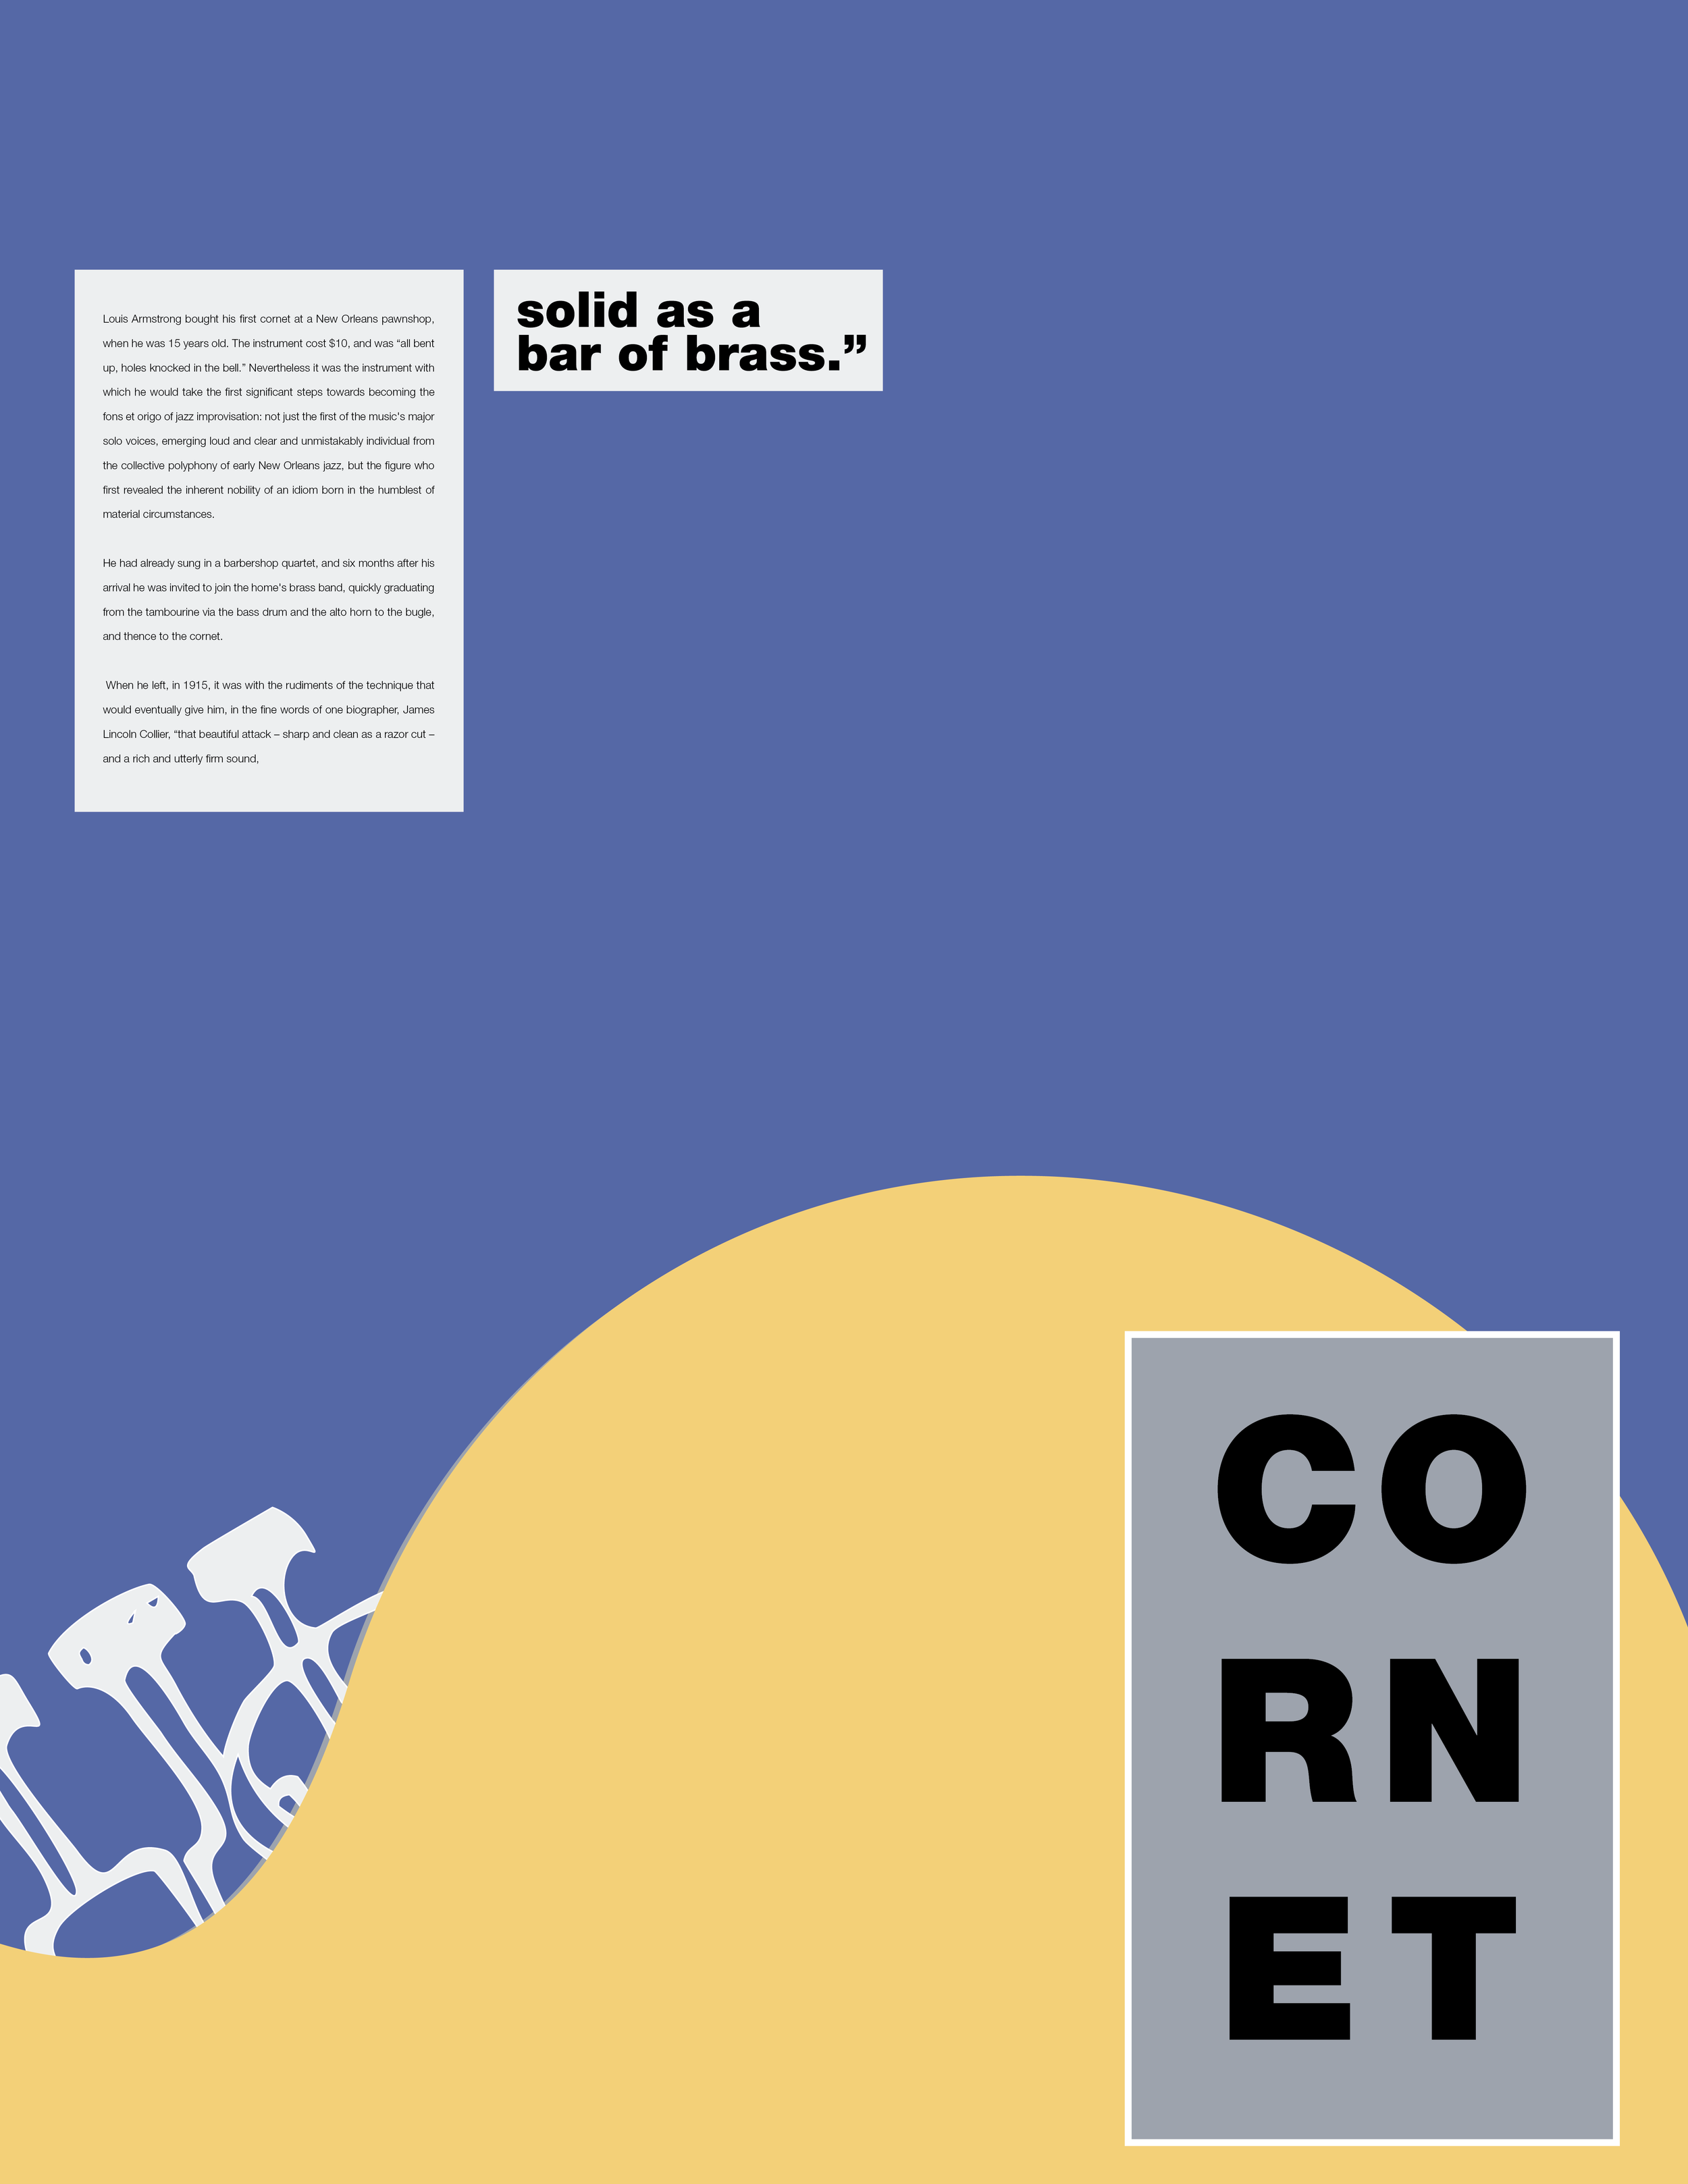 Cornet_Final_Contenders-01.png